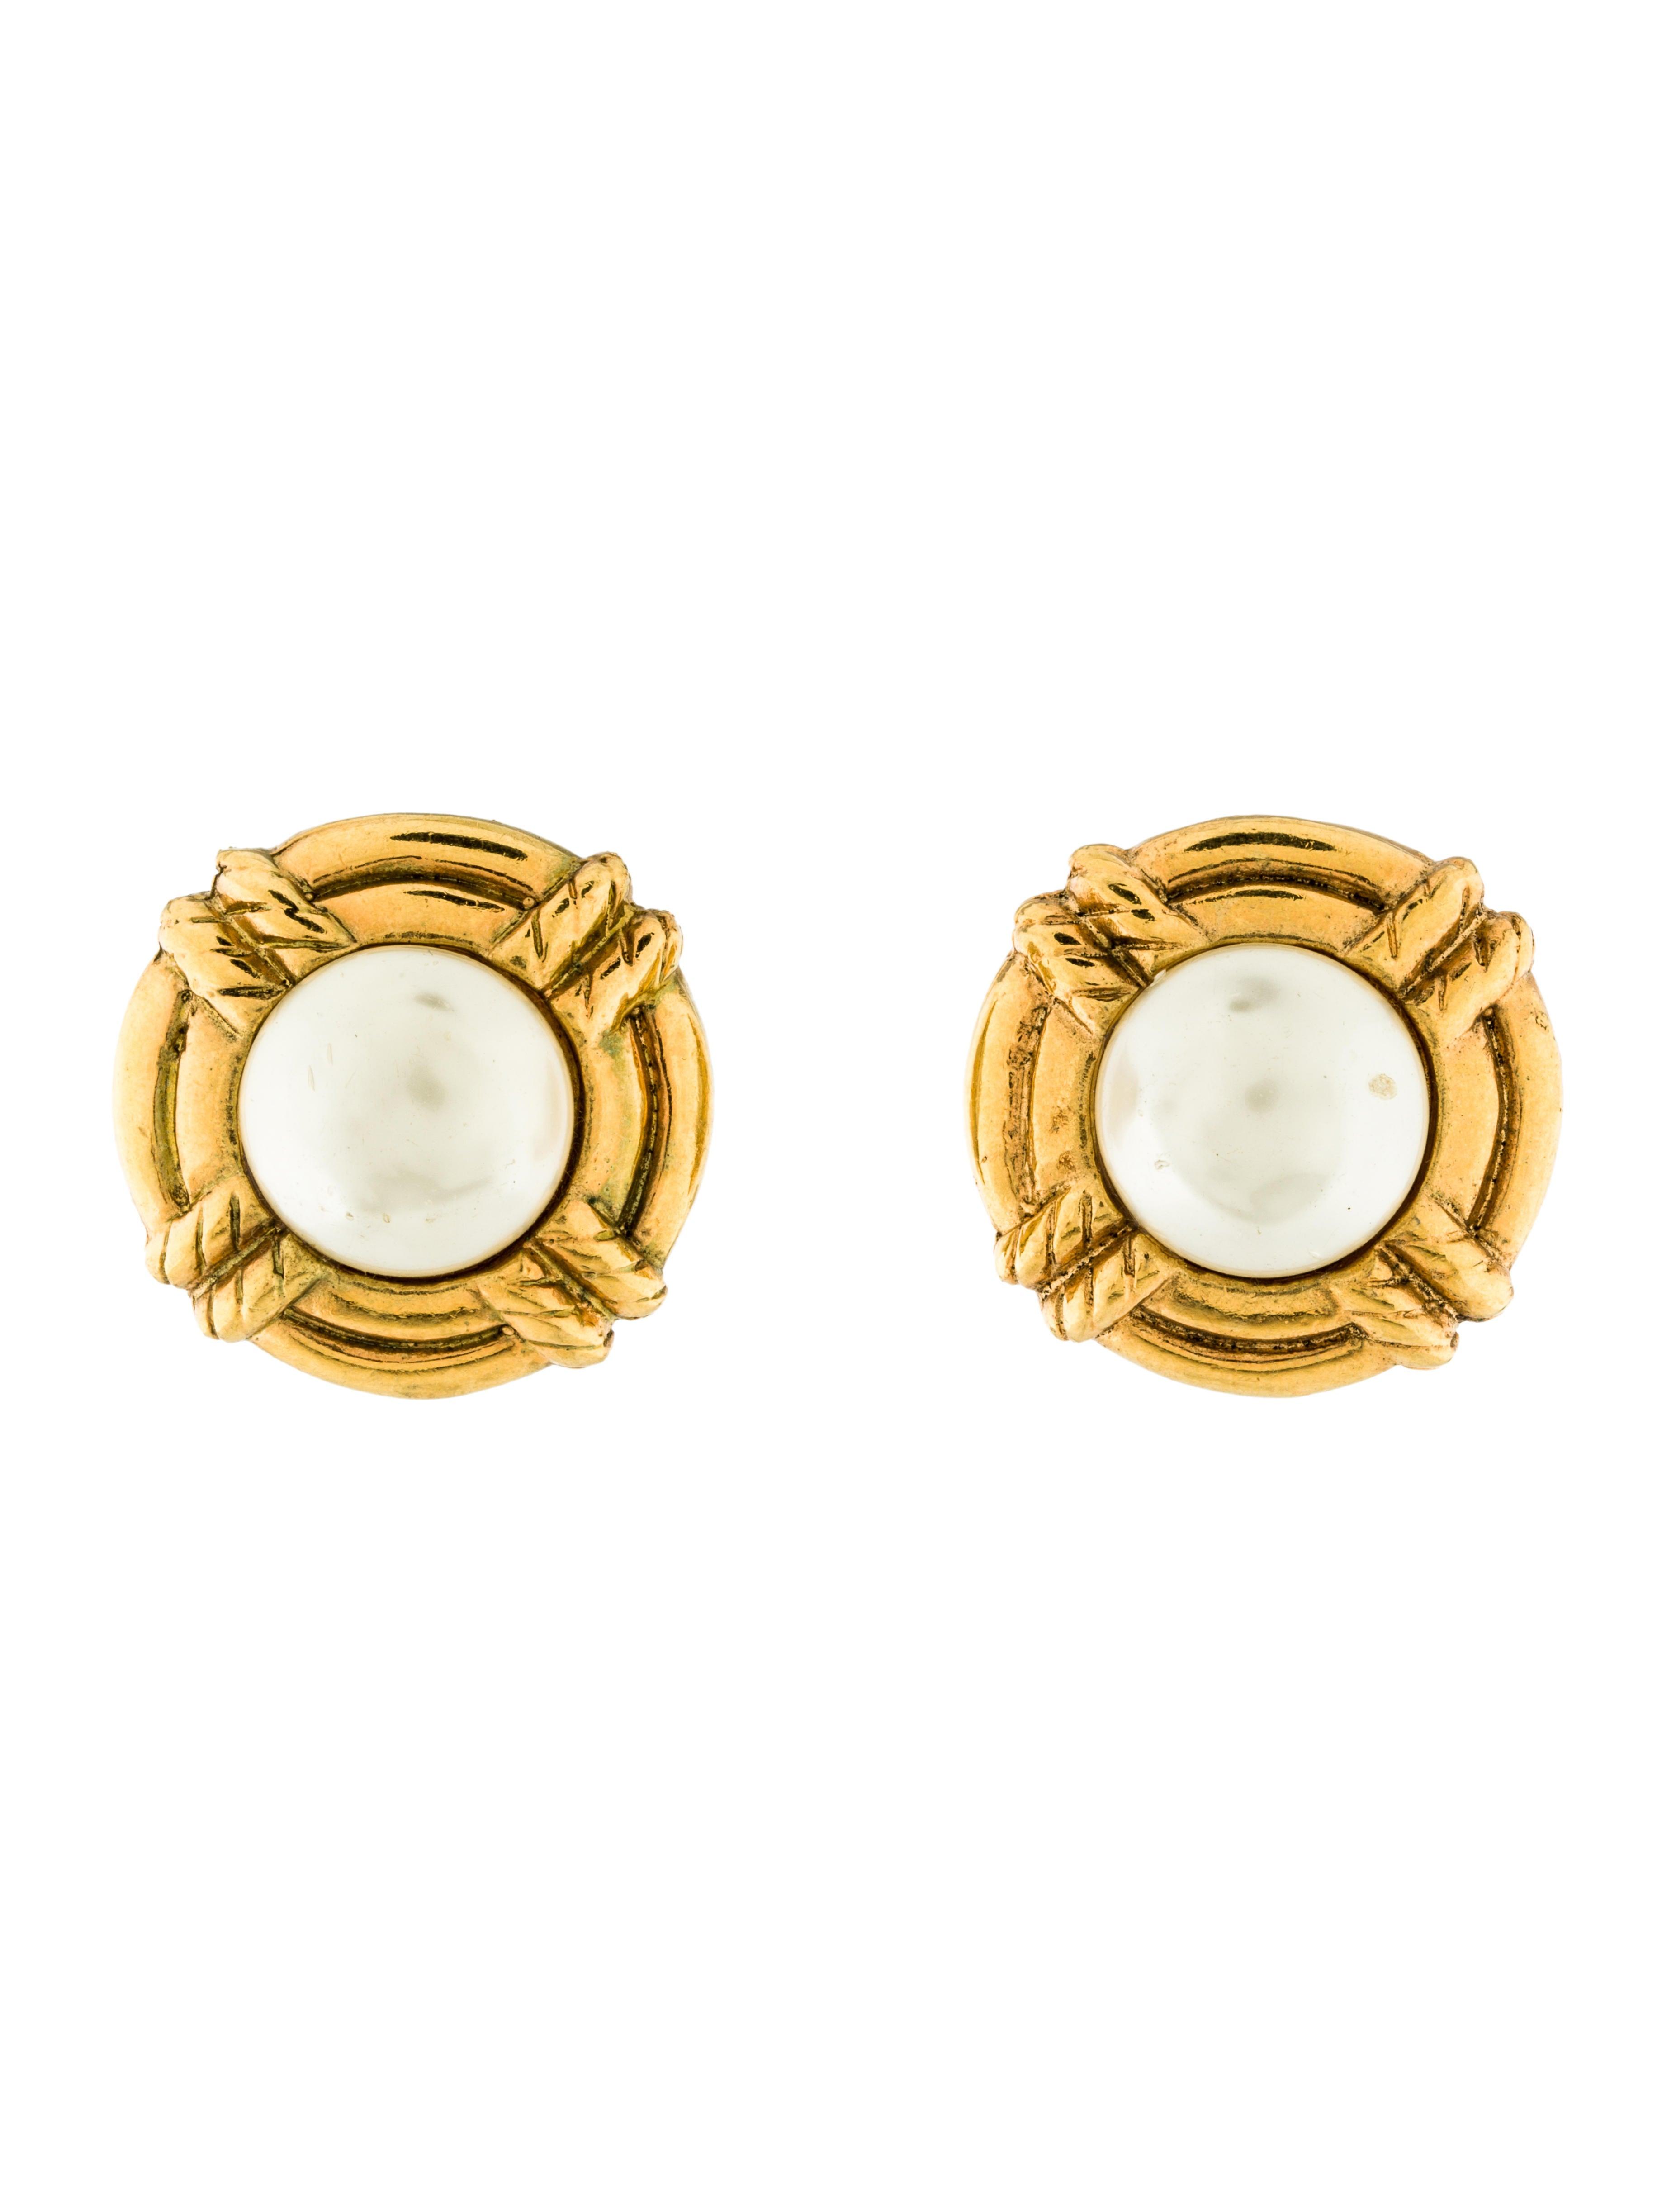 chanel faux pearl clip on earrings earrings cha158330. Black Bedroom Furniture Sets. Home Design Ideas